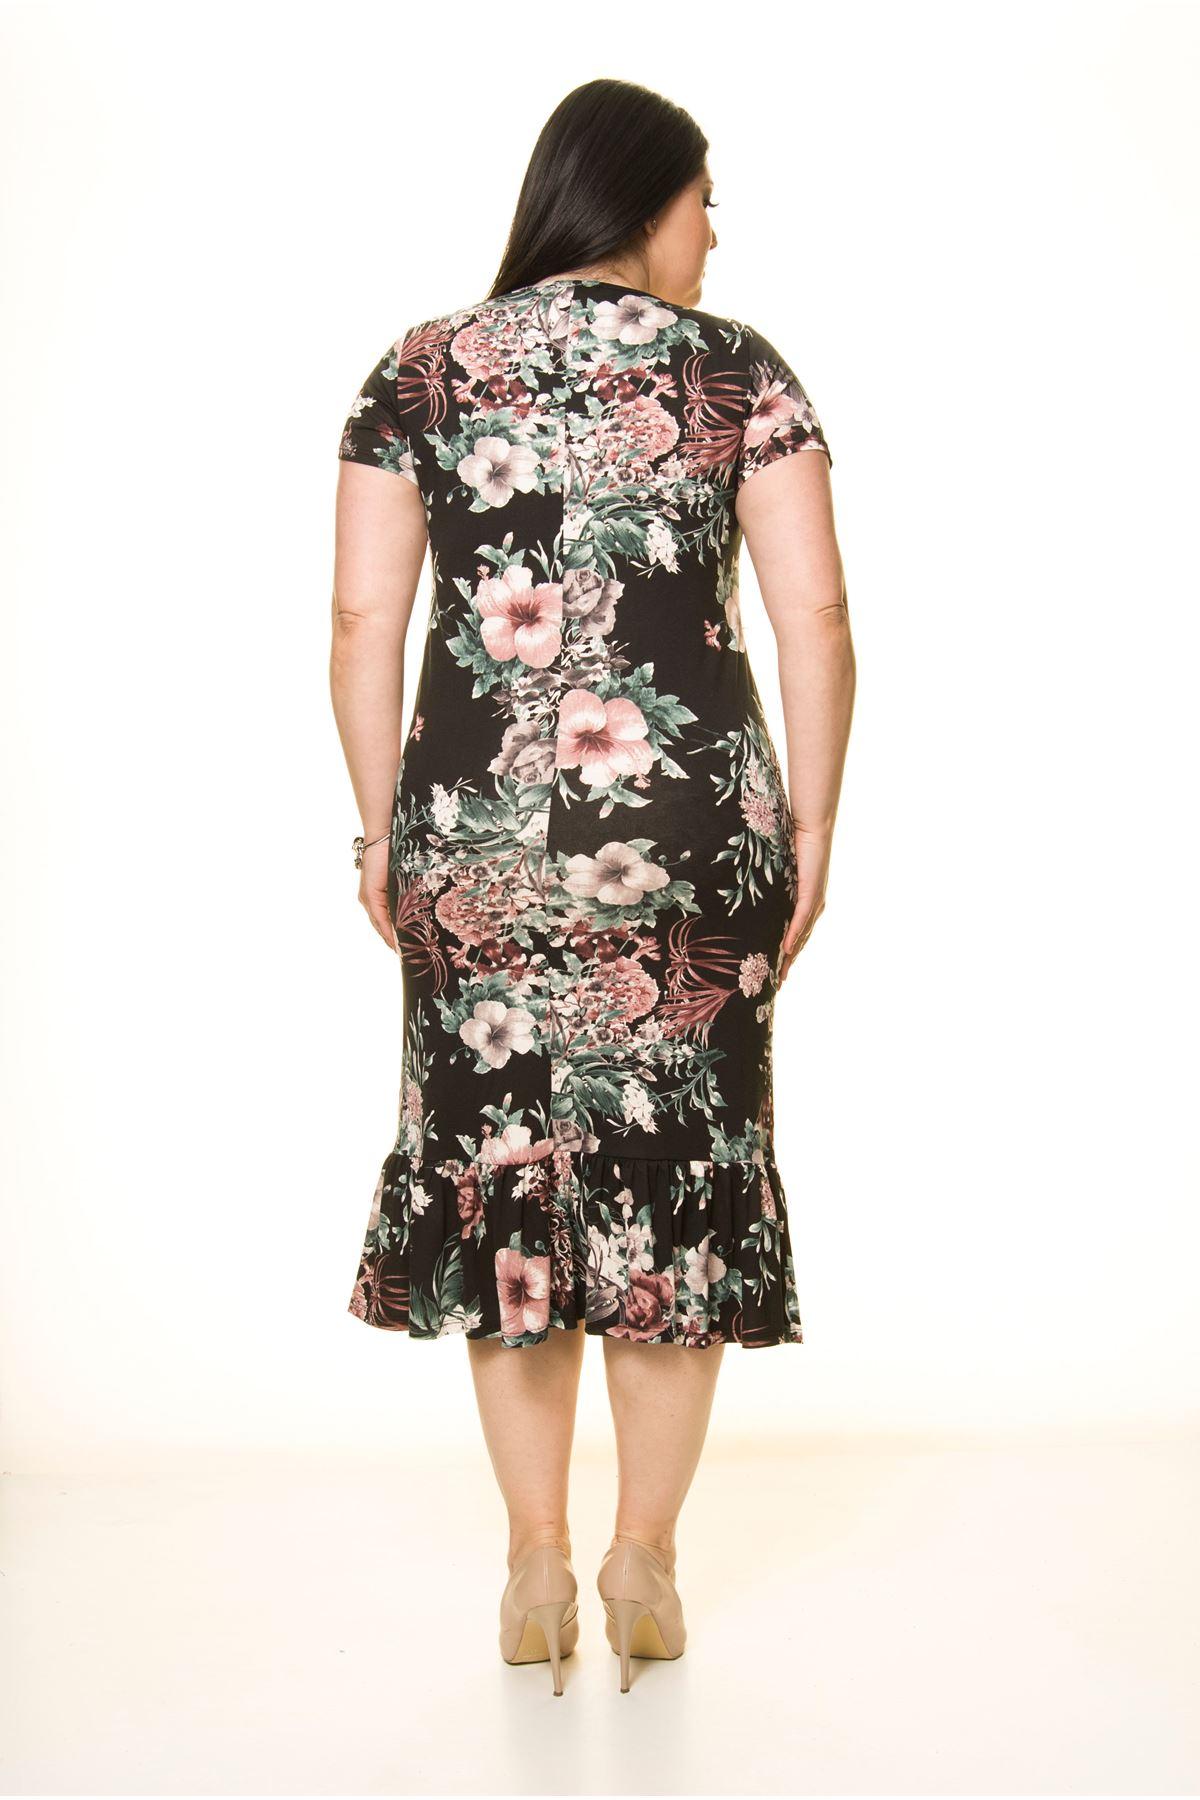 Siyah Büyük Beden Desenli Elbise 8E-1744